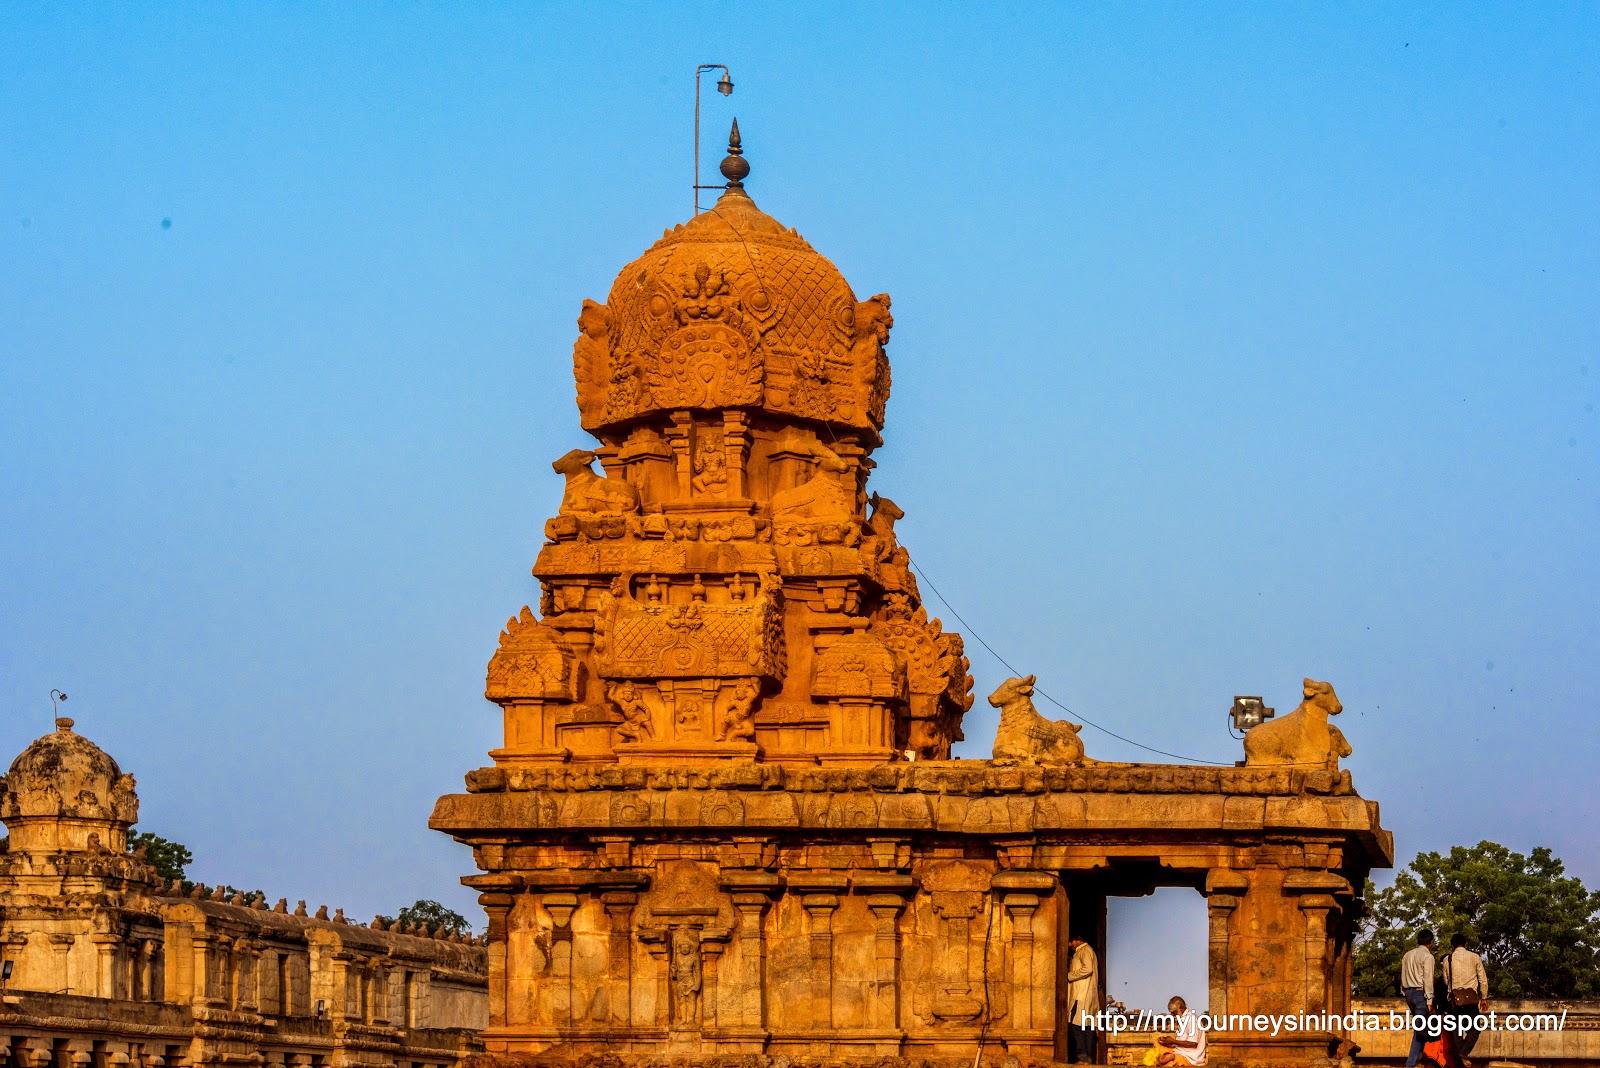 Thanjavur Brihadeeswarar Temple Chandikesvara Inner Tower